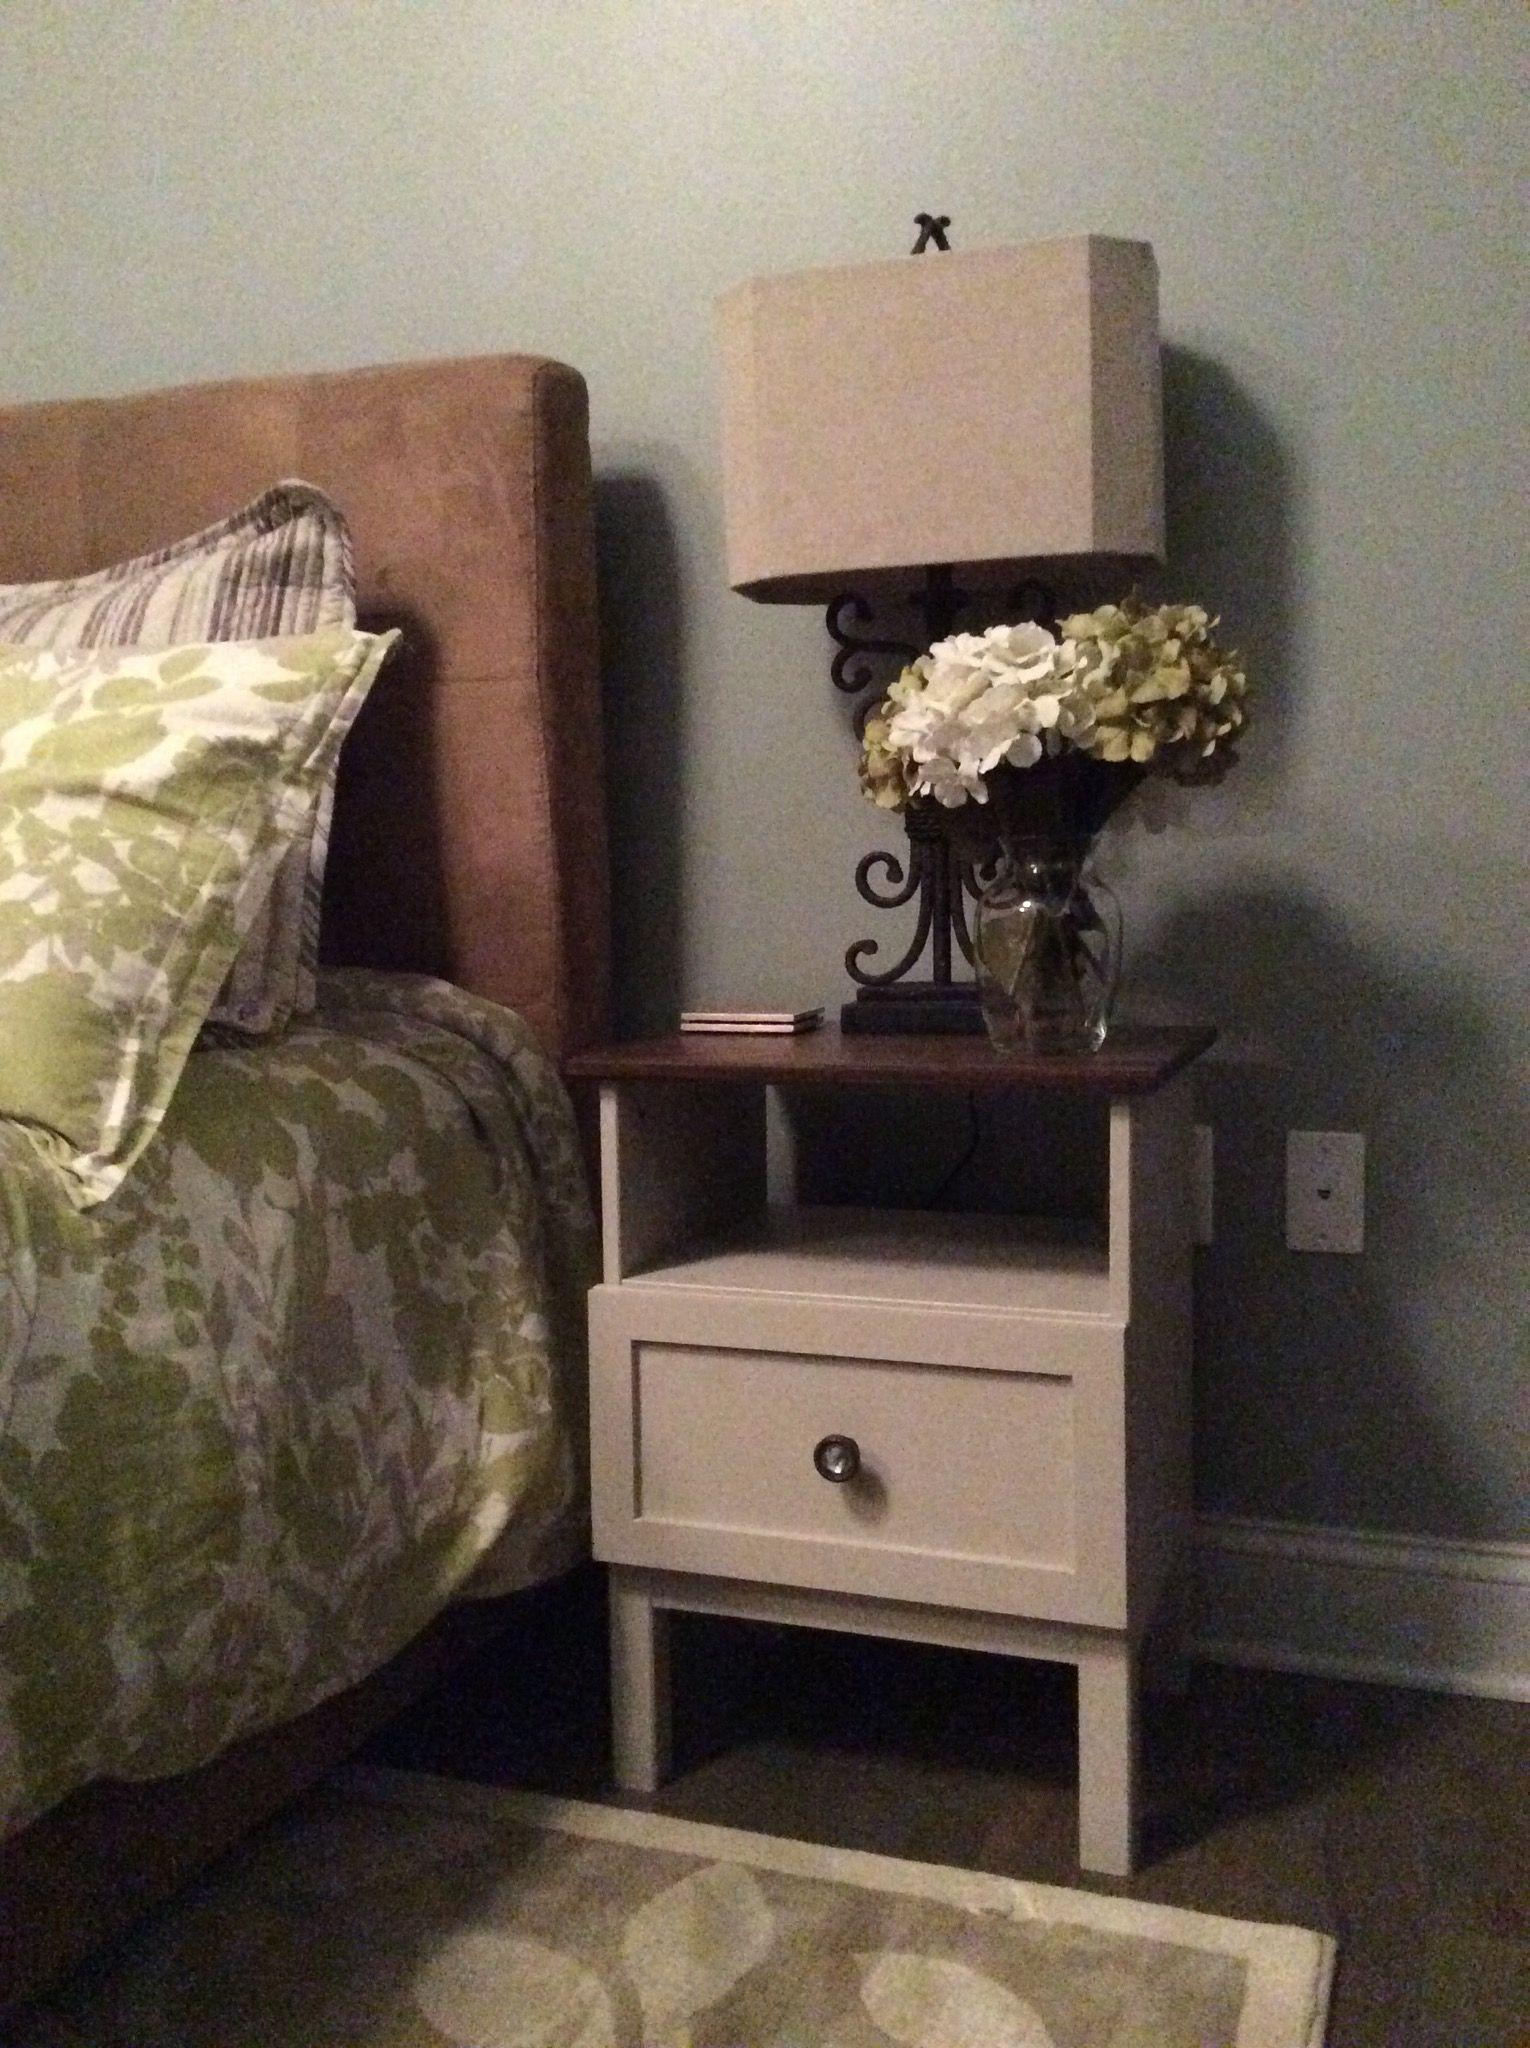 Tarva Nightstand IKEA Hack Apartments, Decorating and